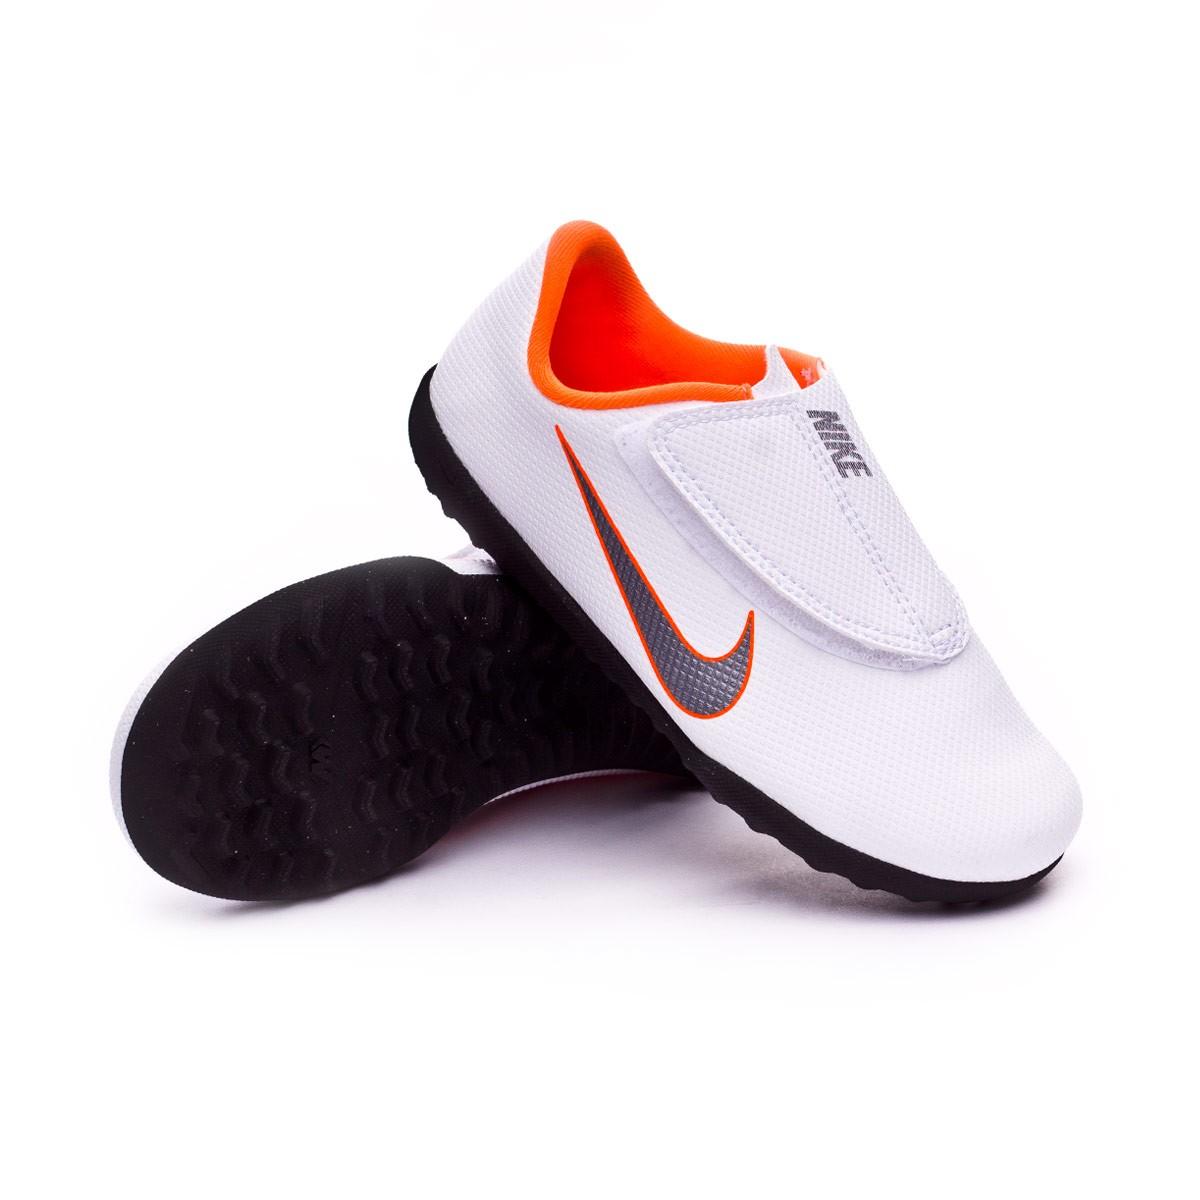 Football Boot Nike Kids Mercurial VaporX XII Club PS Velcro Turf ... a1f29574bab32